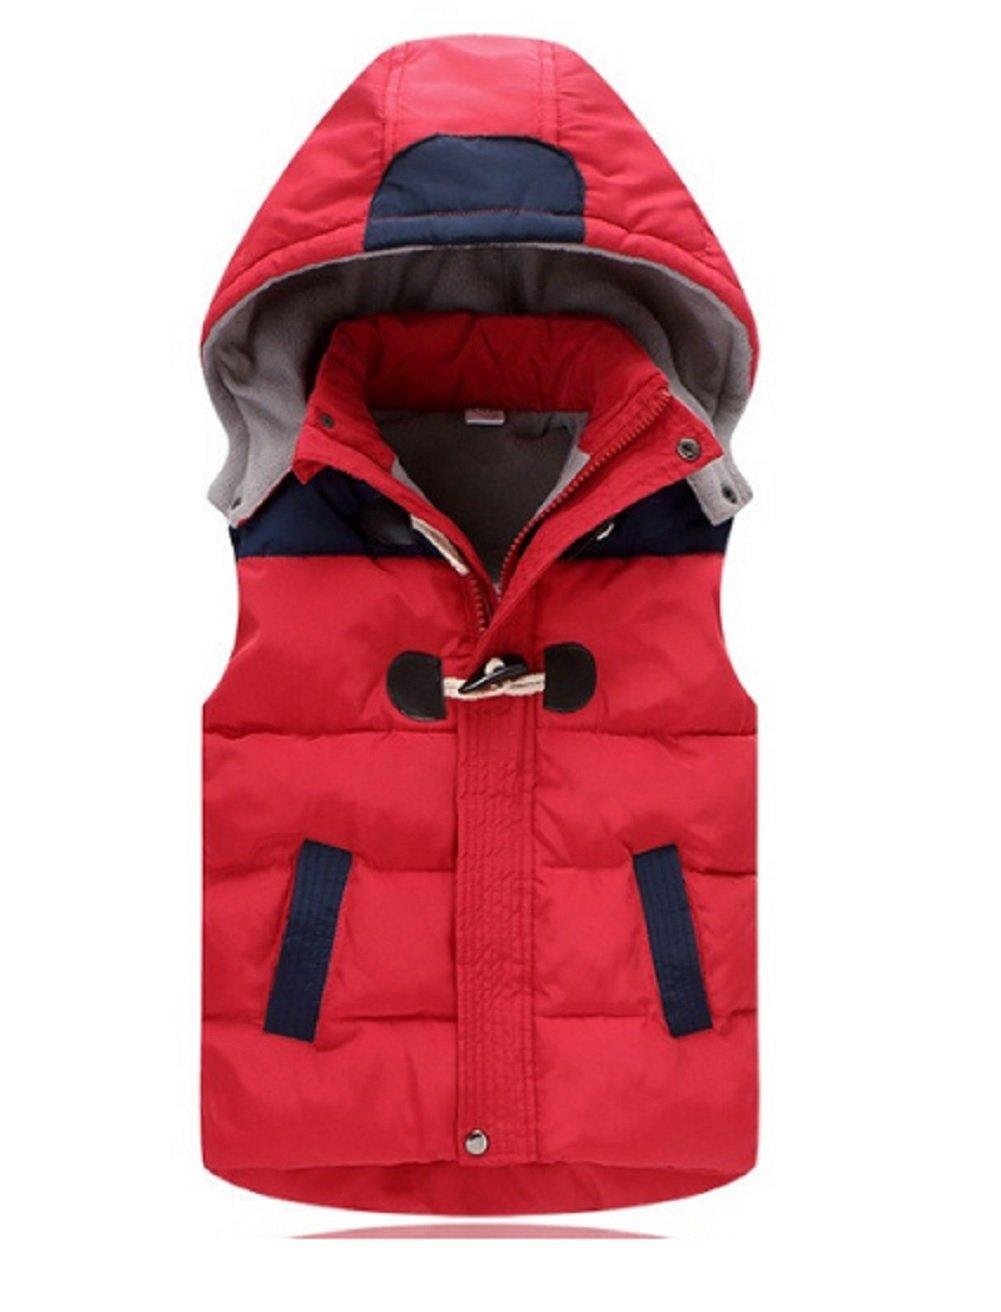 Koo-T Boys Gilet Body Warmer Hooded Sleeveless Coat Down Winter Age Size